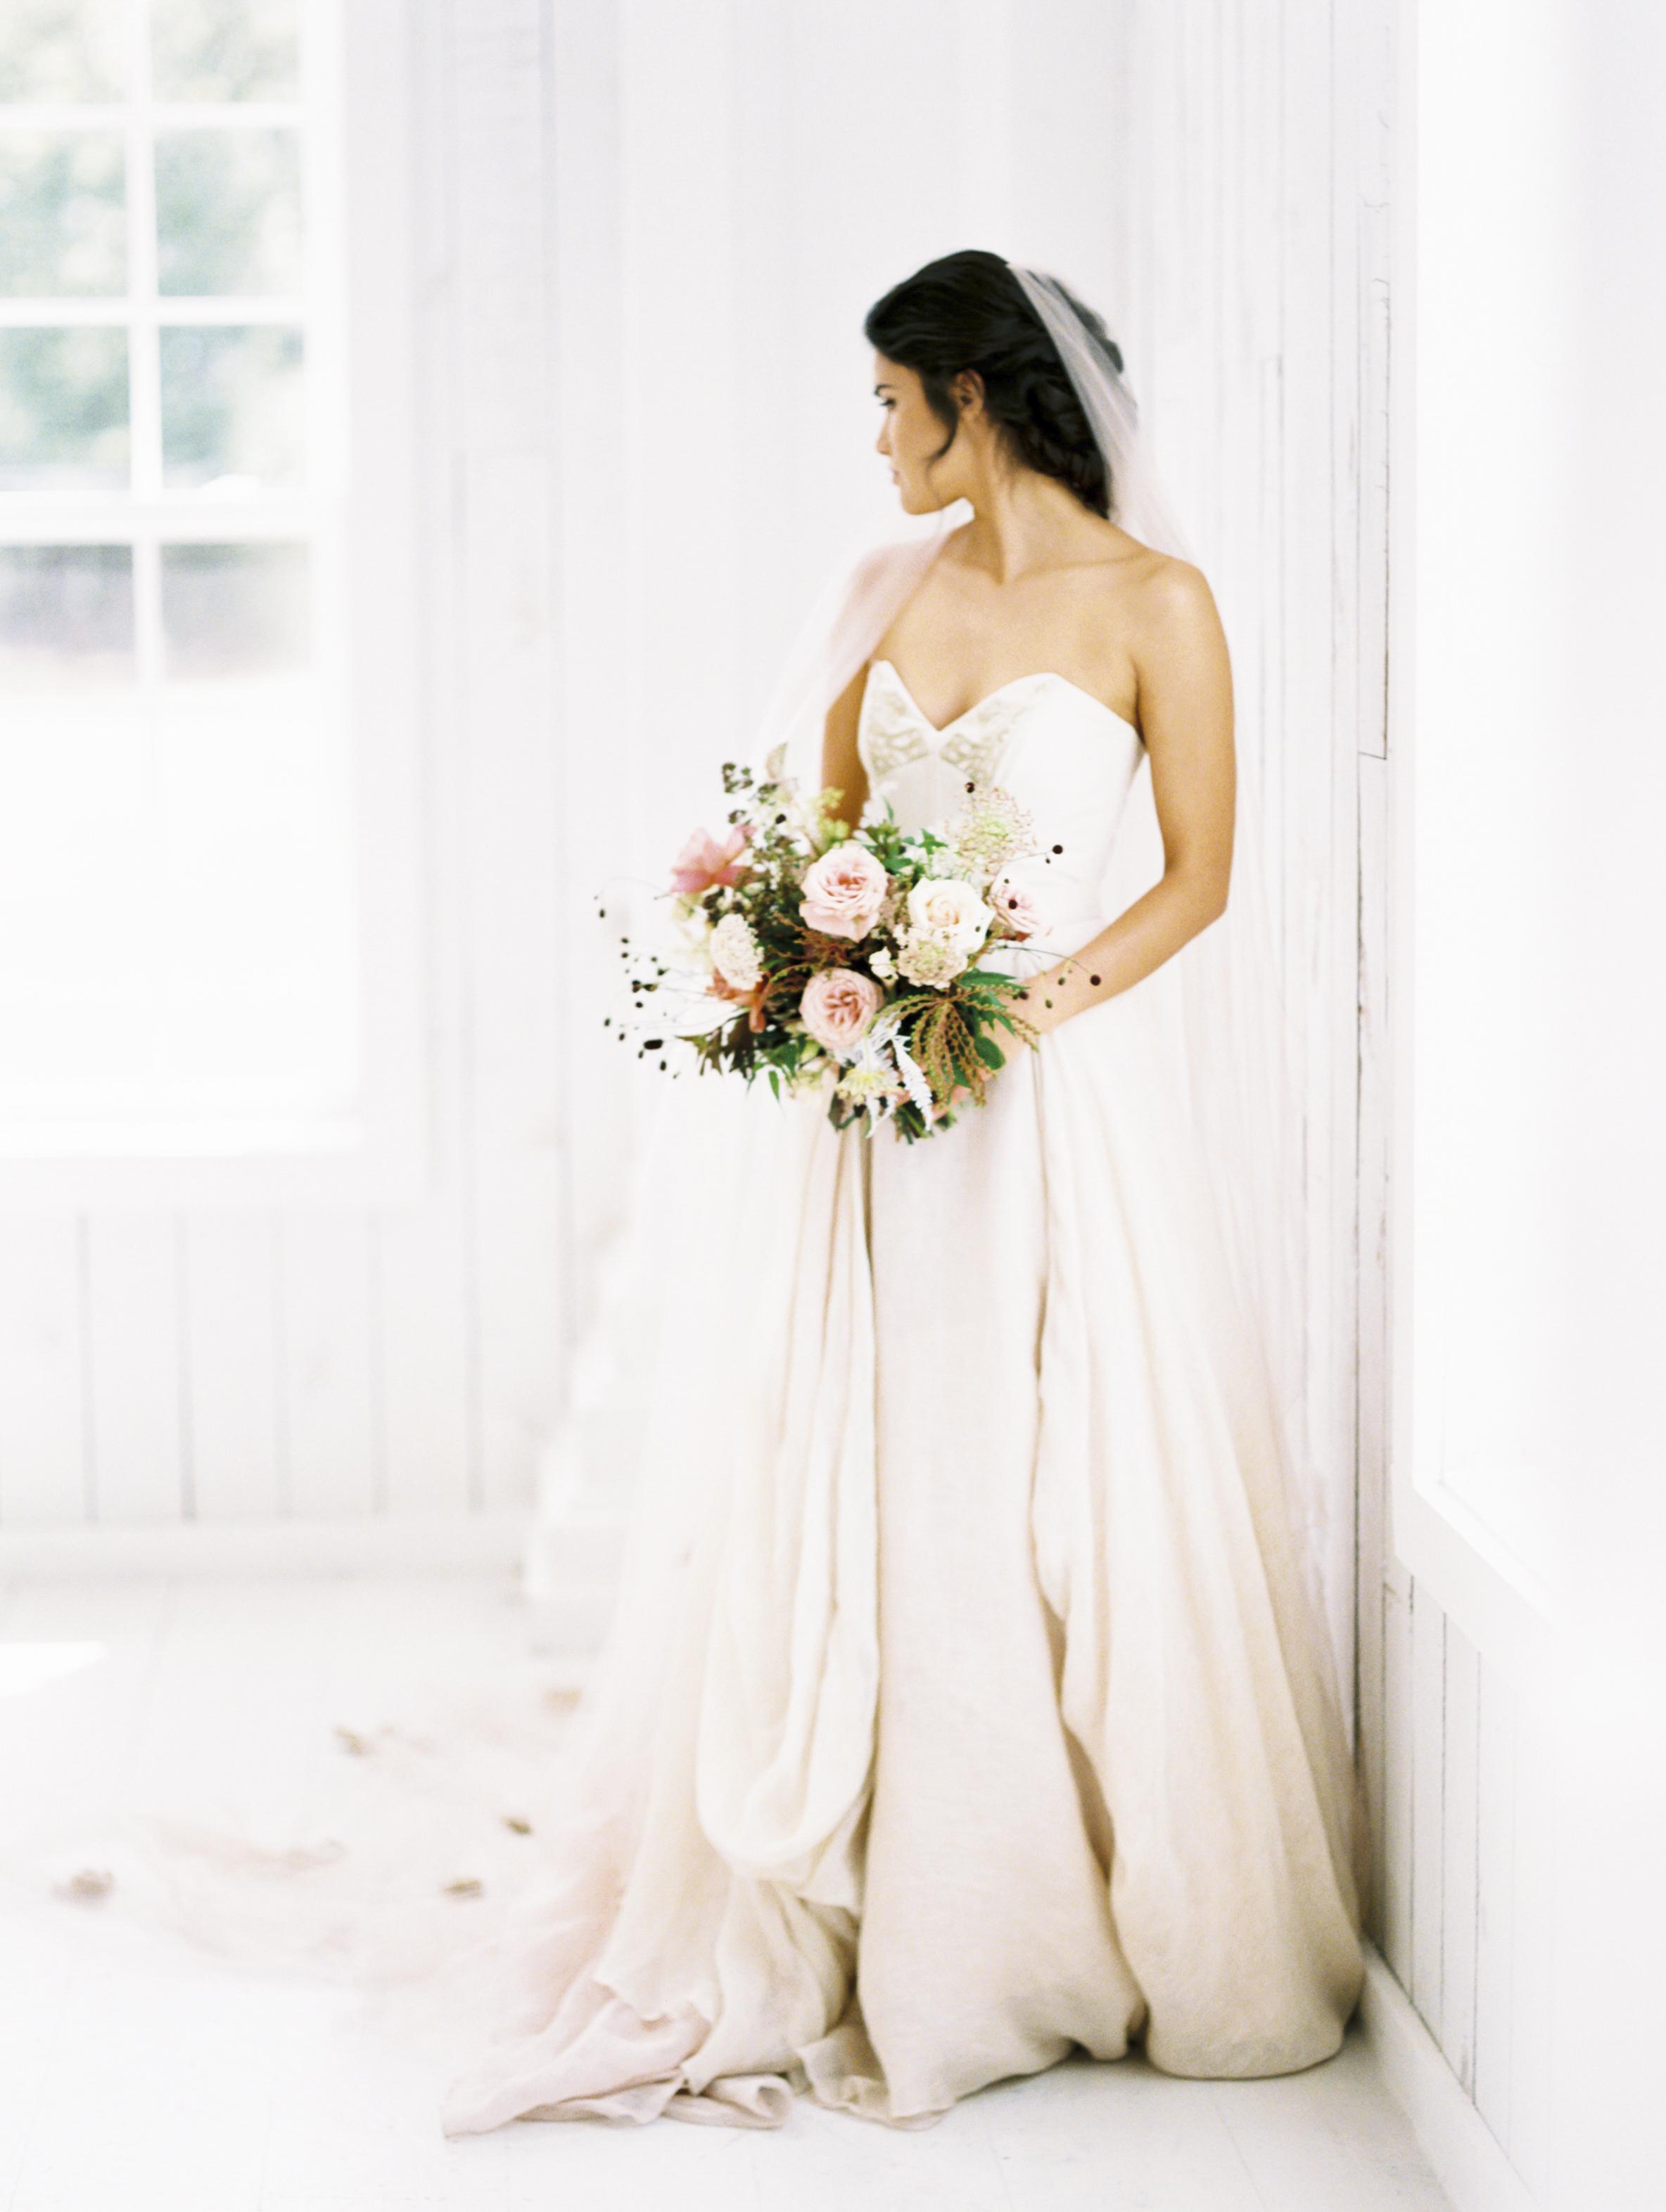 Carol Hannah fritillary wedding dress kensington skirt-1-260Carol Hannah fritillary wedding dress kensington skirt-1-260.JPG